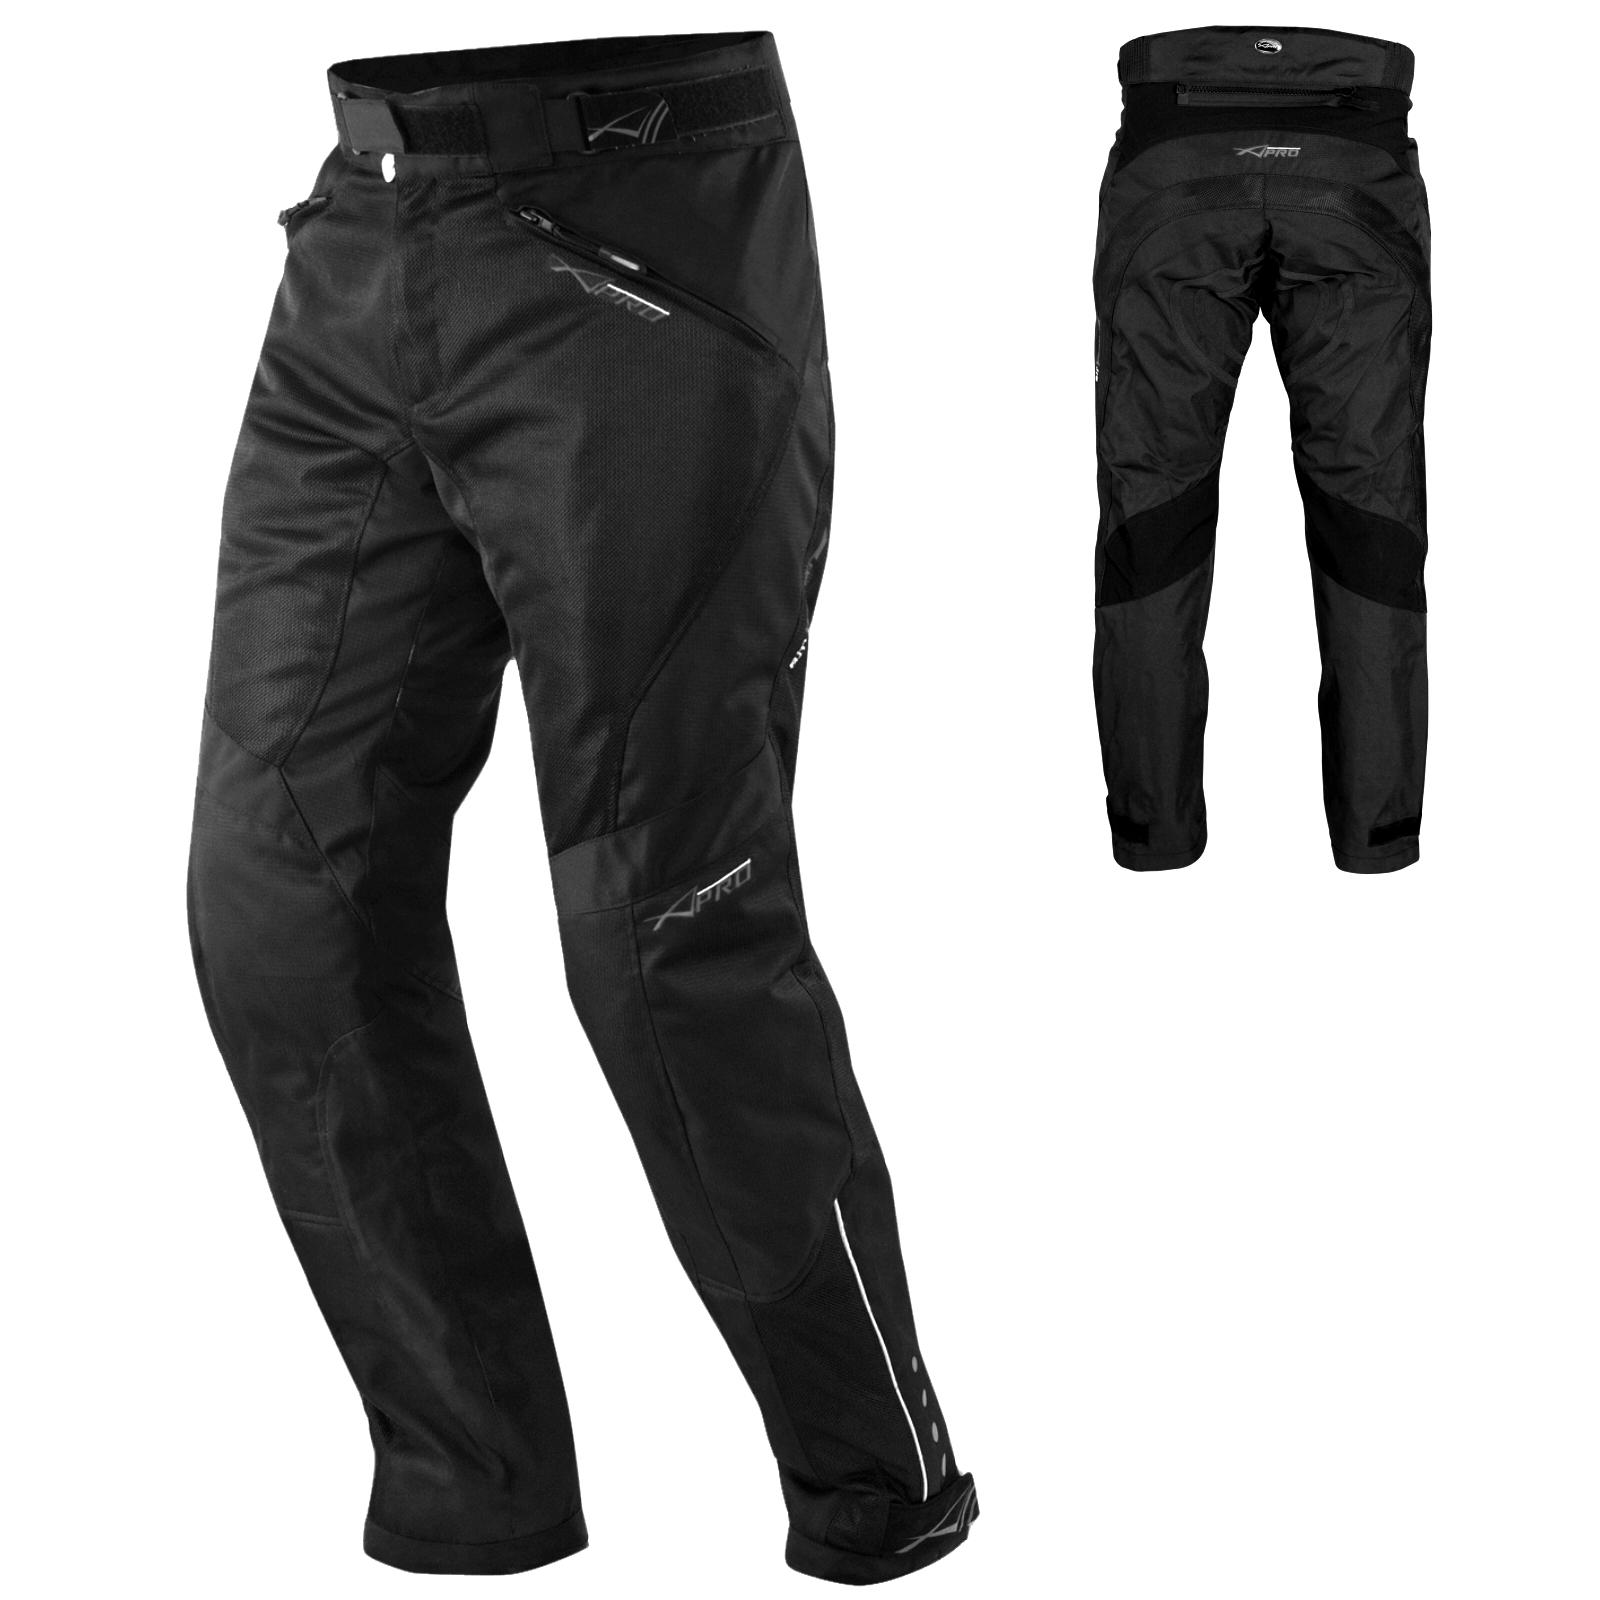 Pantaloni-Mesh-Traforato-Traspirante-Tessuto-Tecnico-Moto-Touring-Donna-Turismo